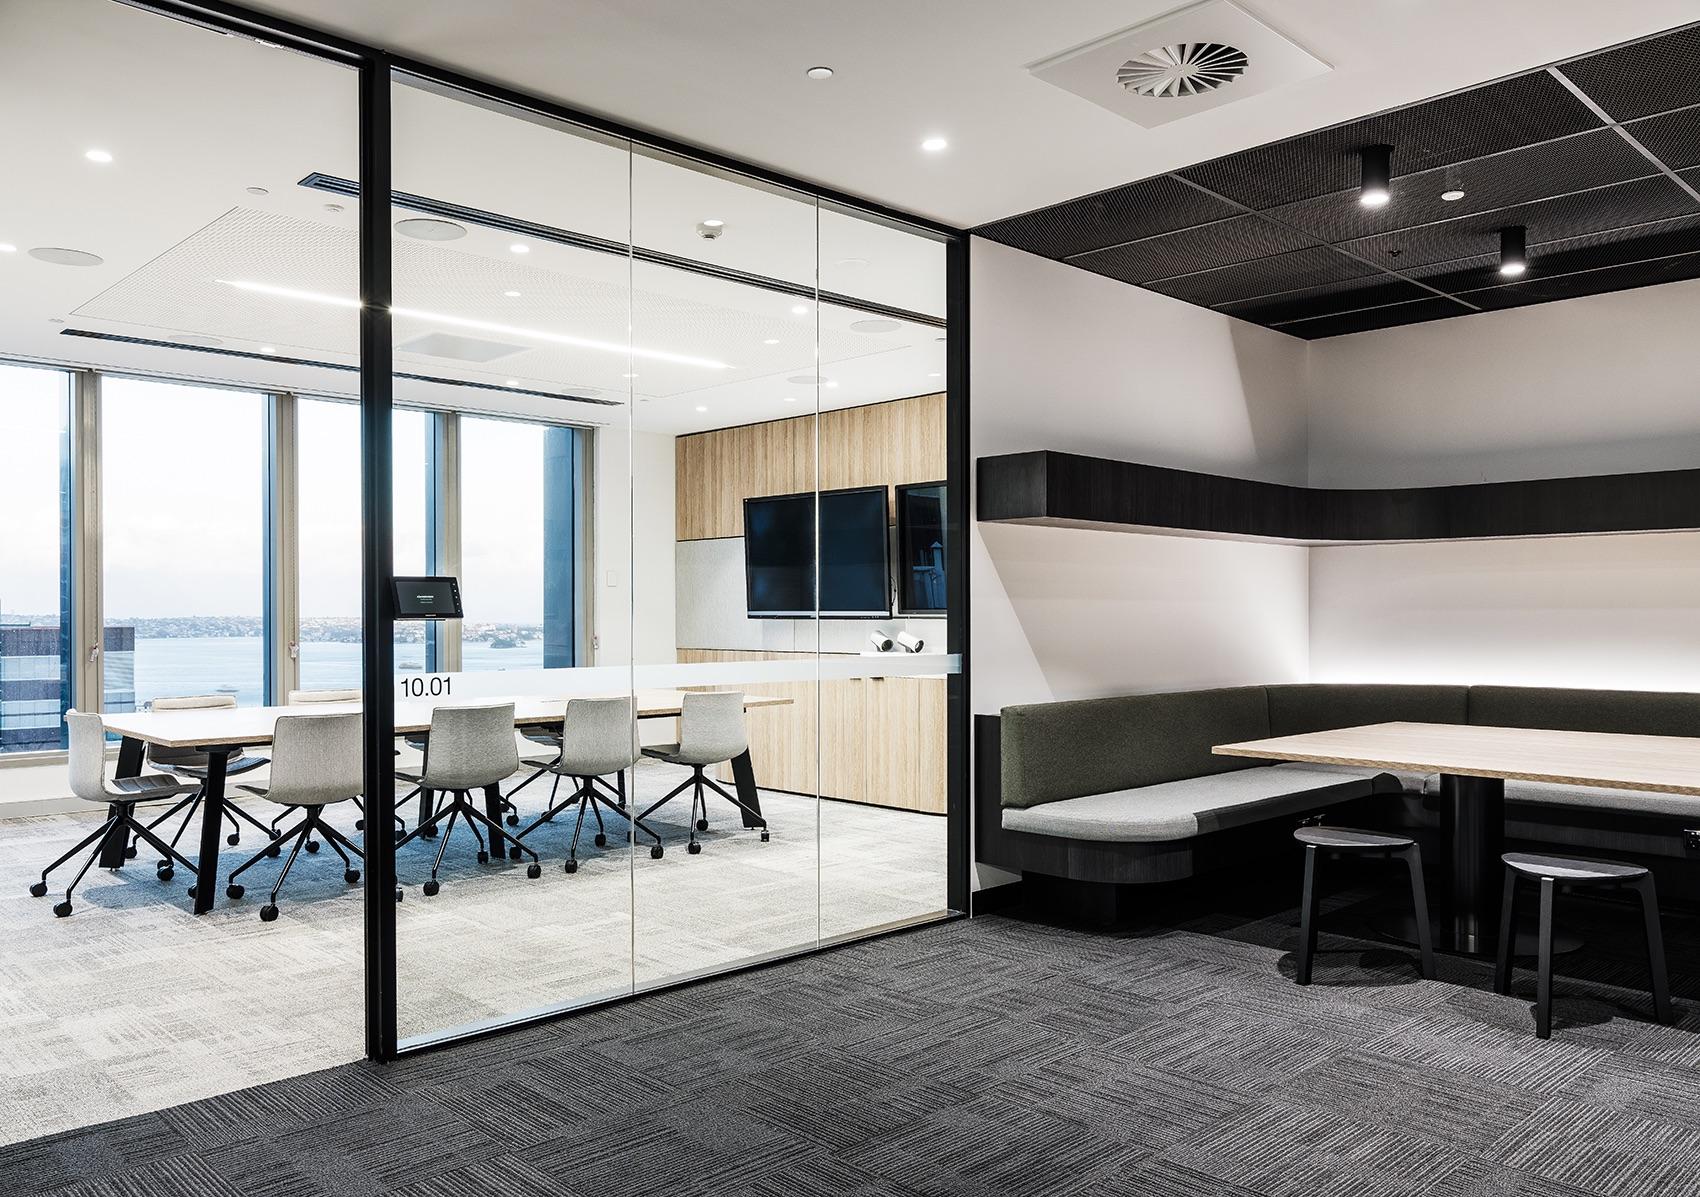 broadspectrum-office-9